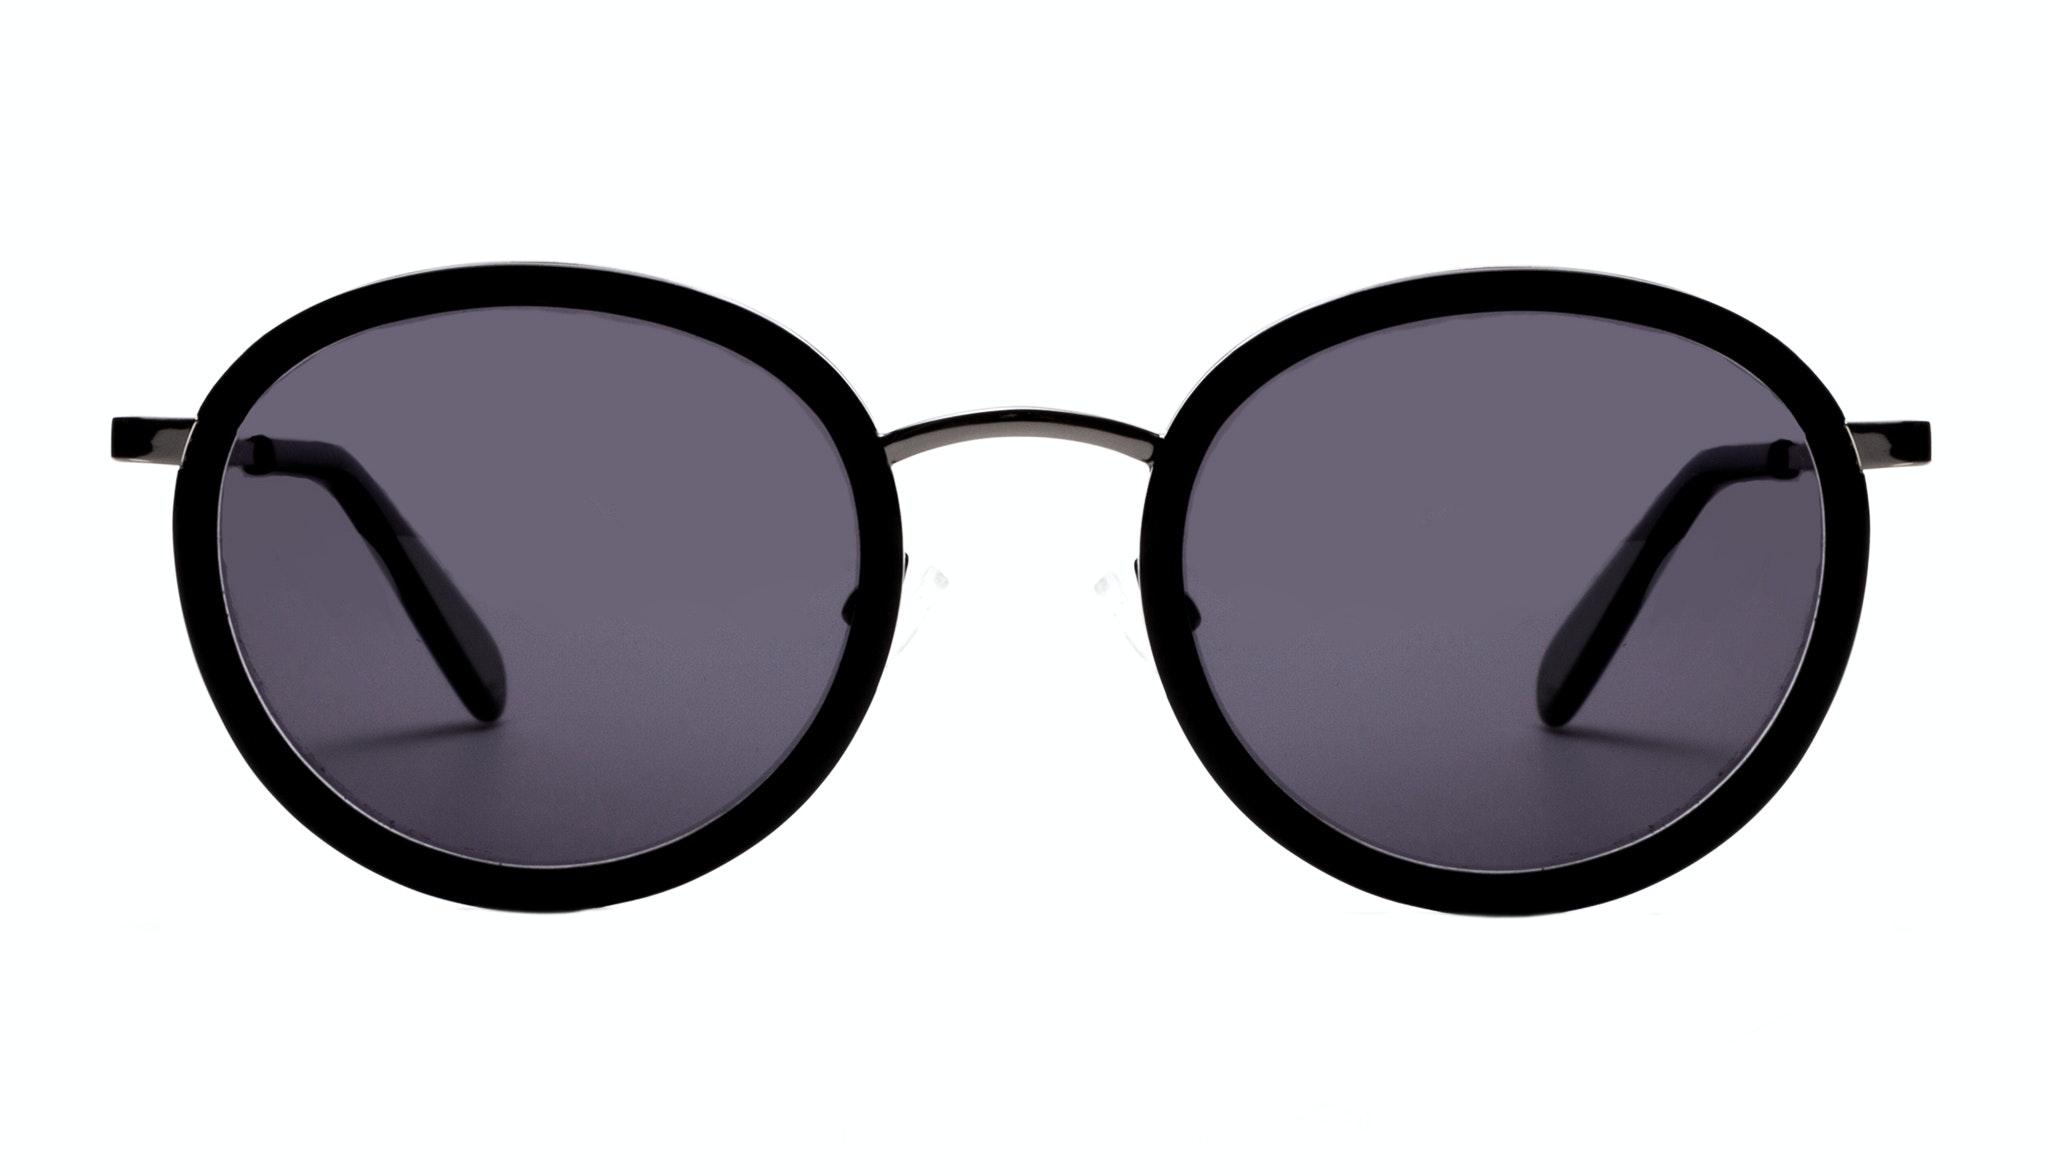 Affordable Fashion Glasses Round Sunglasses Women Strike Onyx